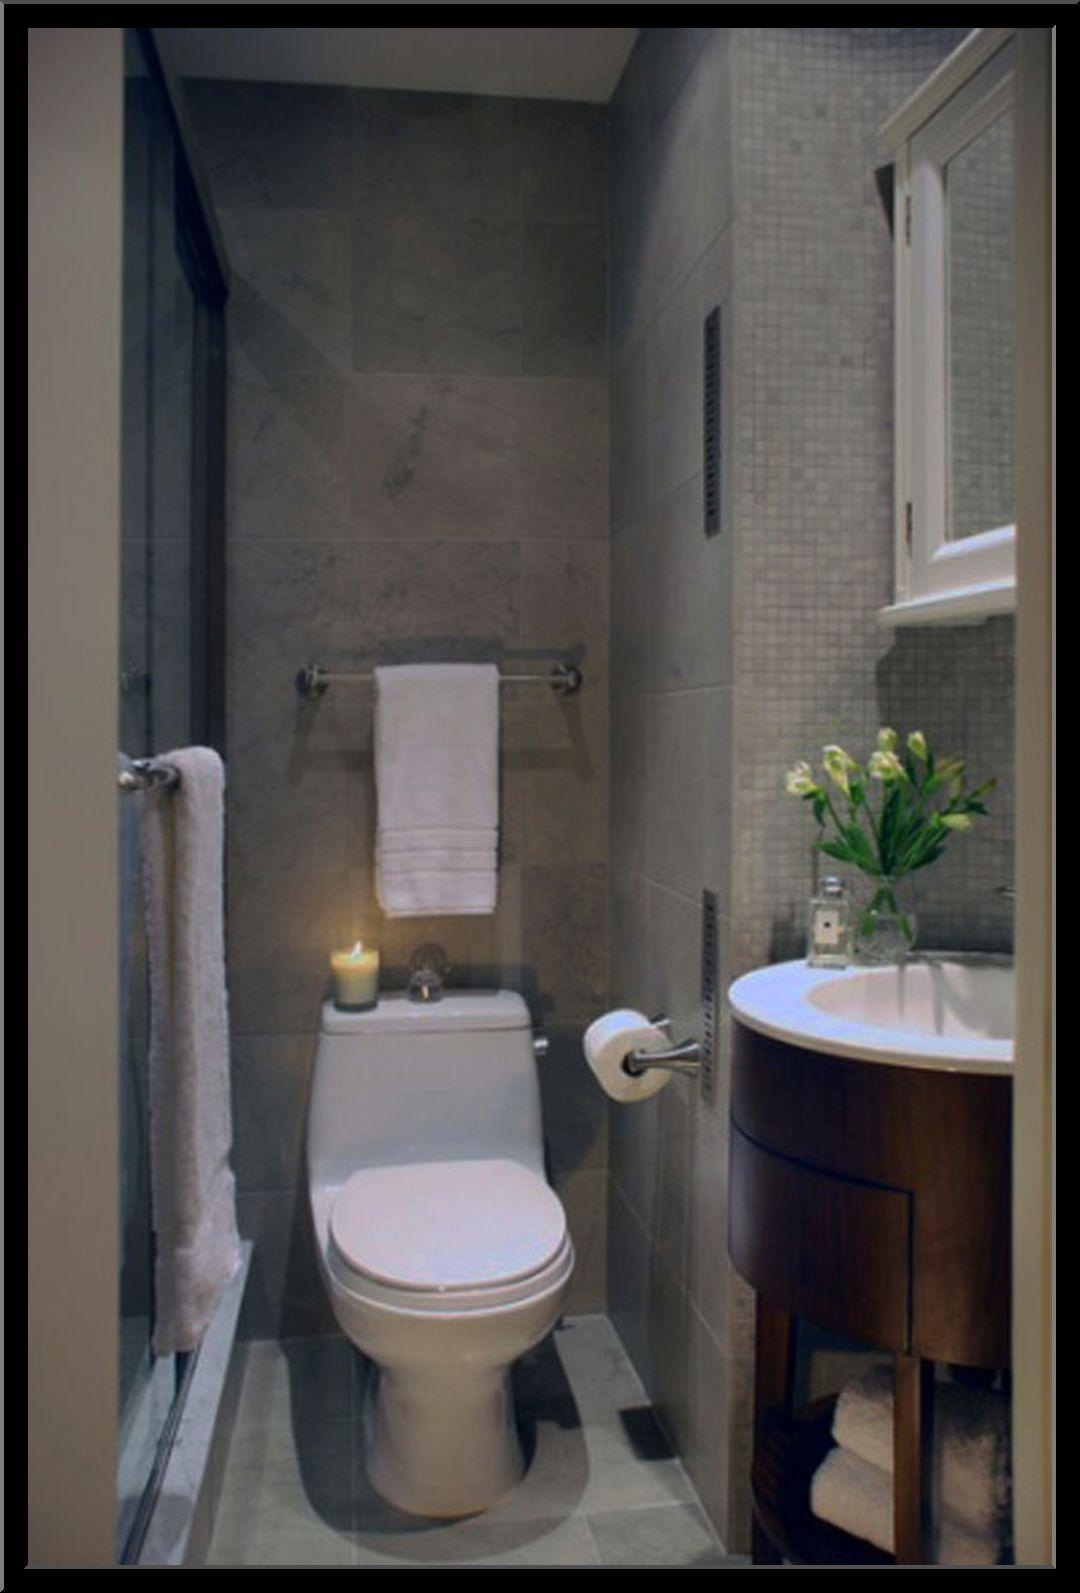 very small bathroom ideas interior design bathroom small on bathroom renovation ideas for small bathrooms id=60232